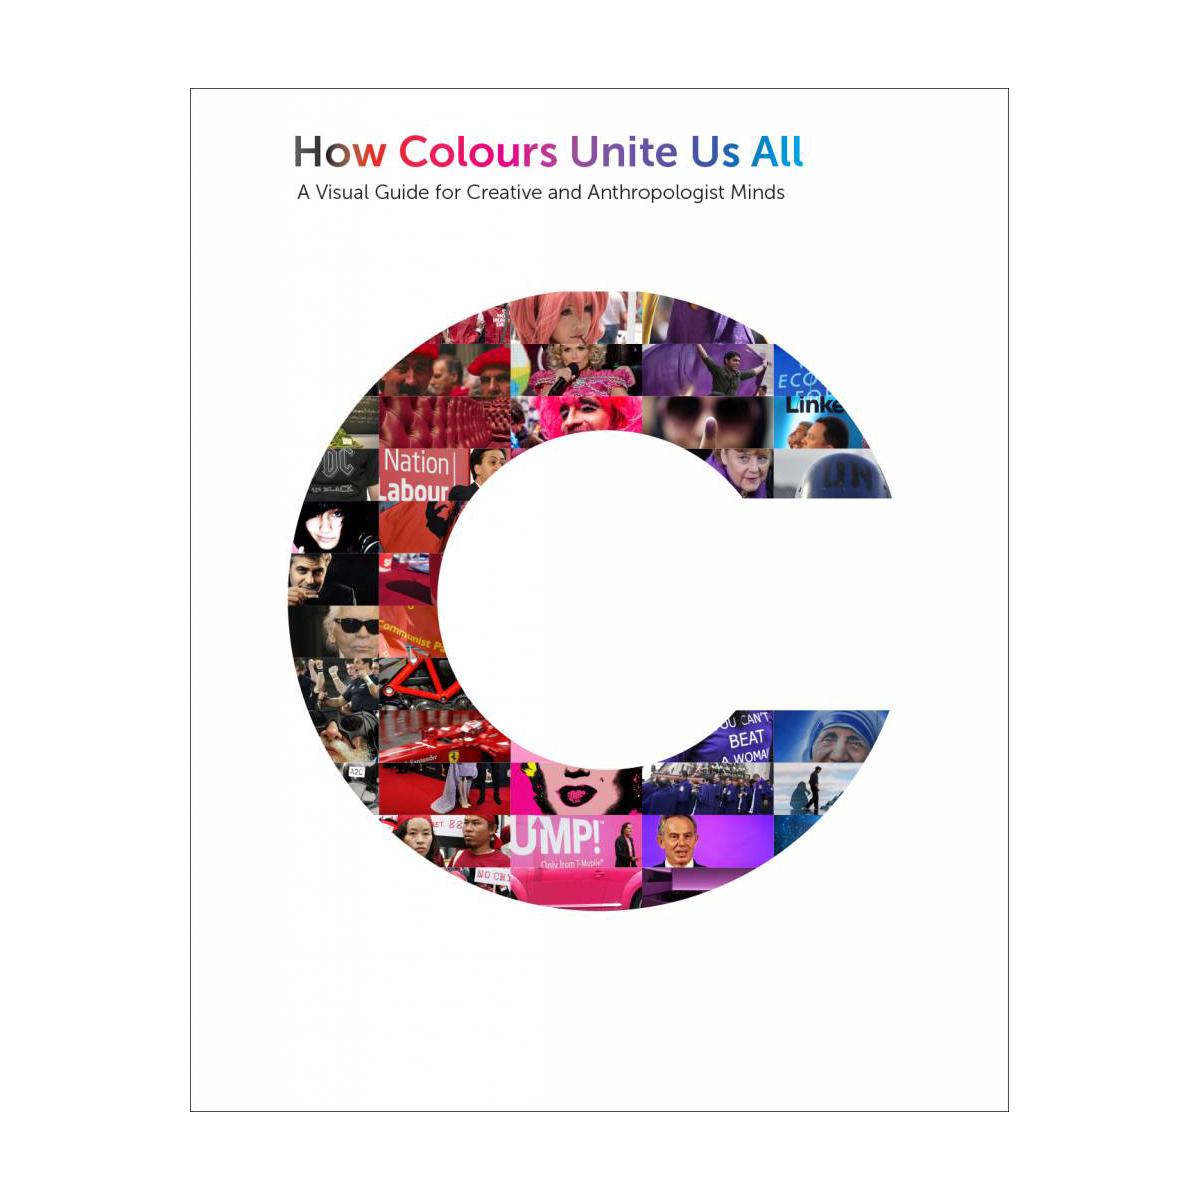 colours unite us all